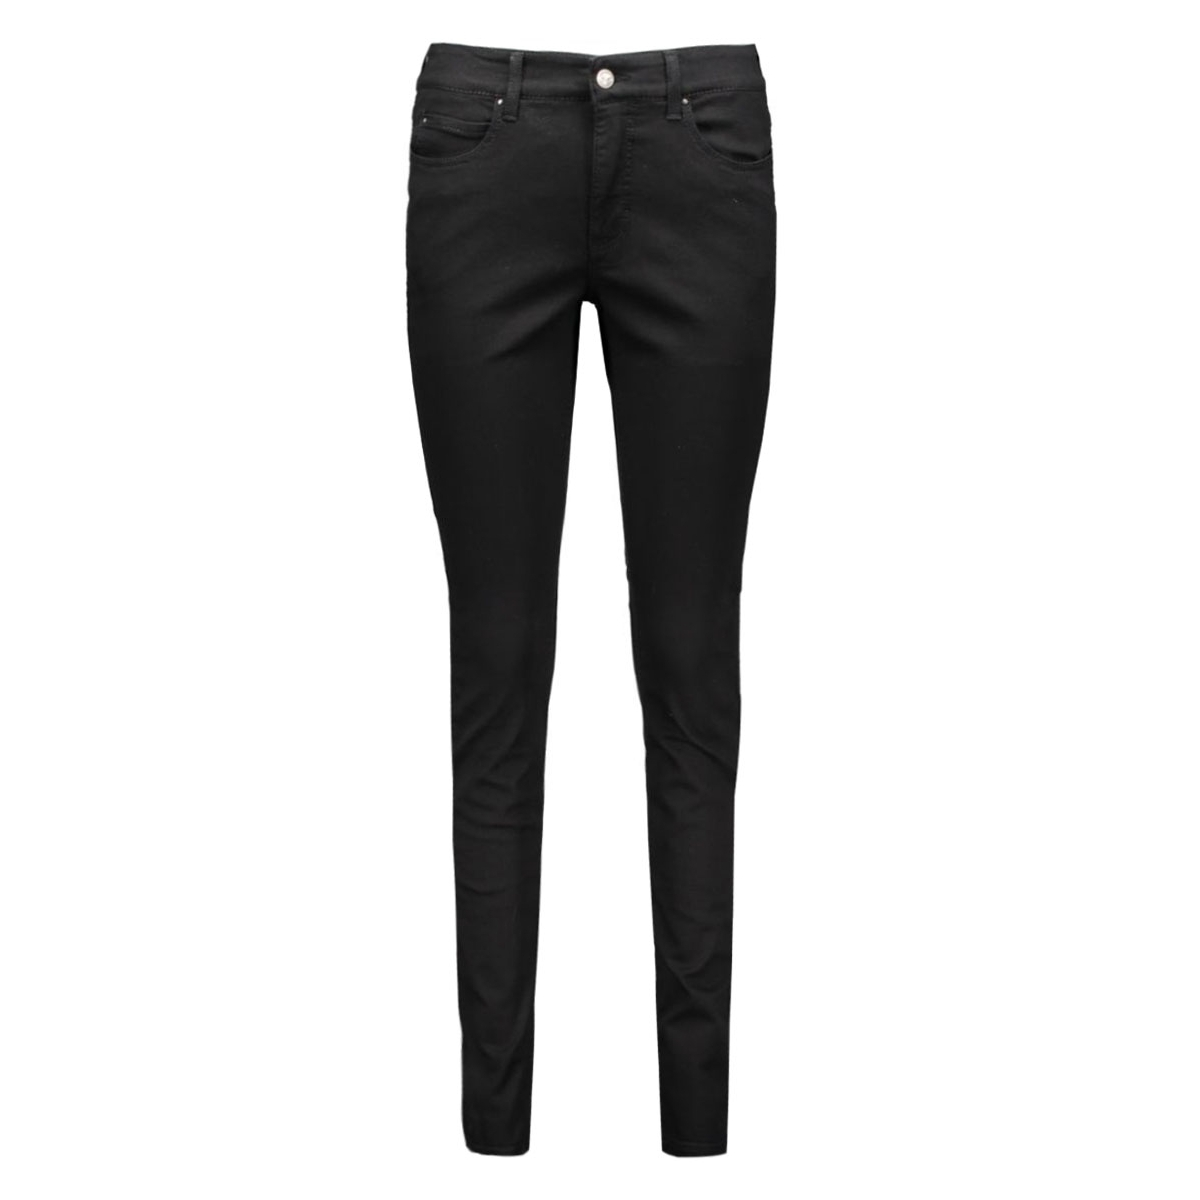 5402 90 0355l 16 mac jeans d999